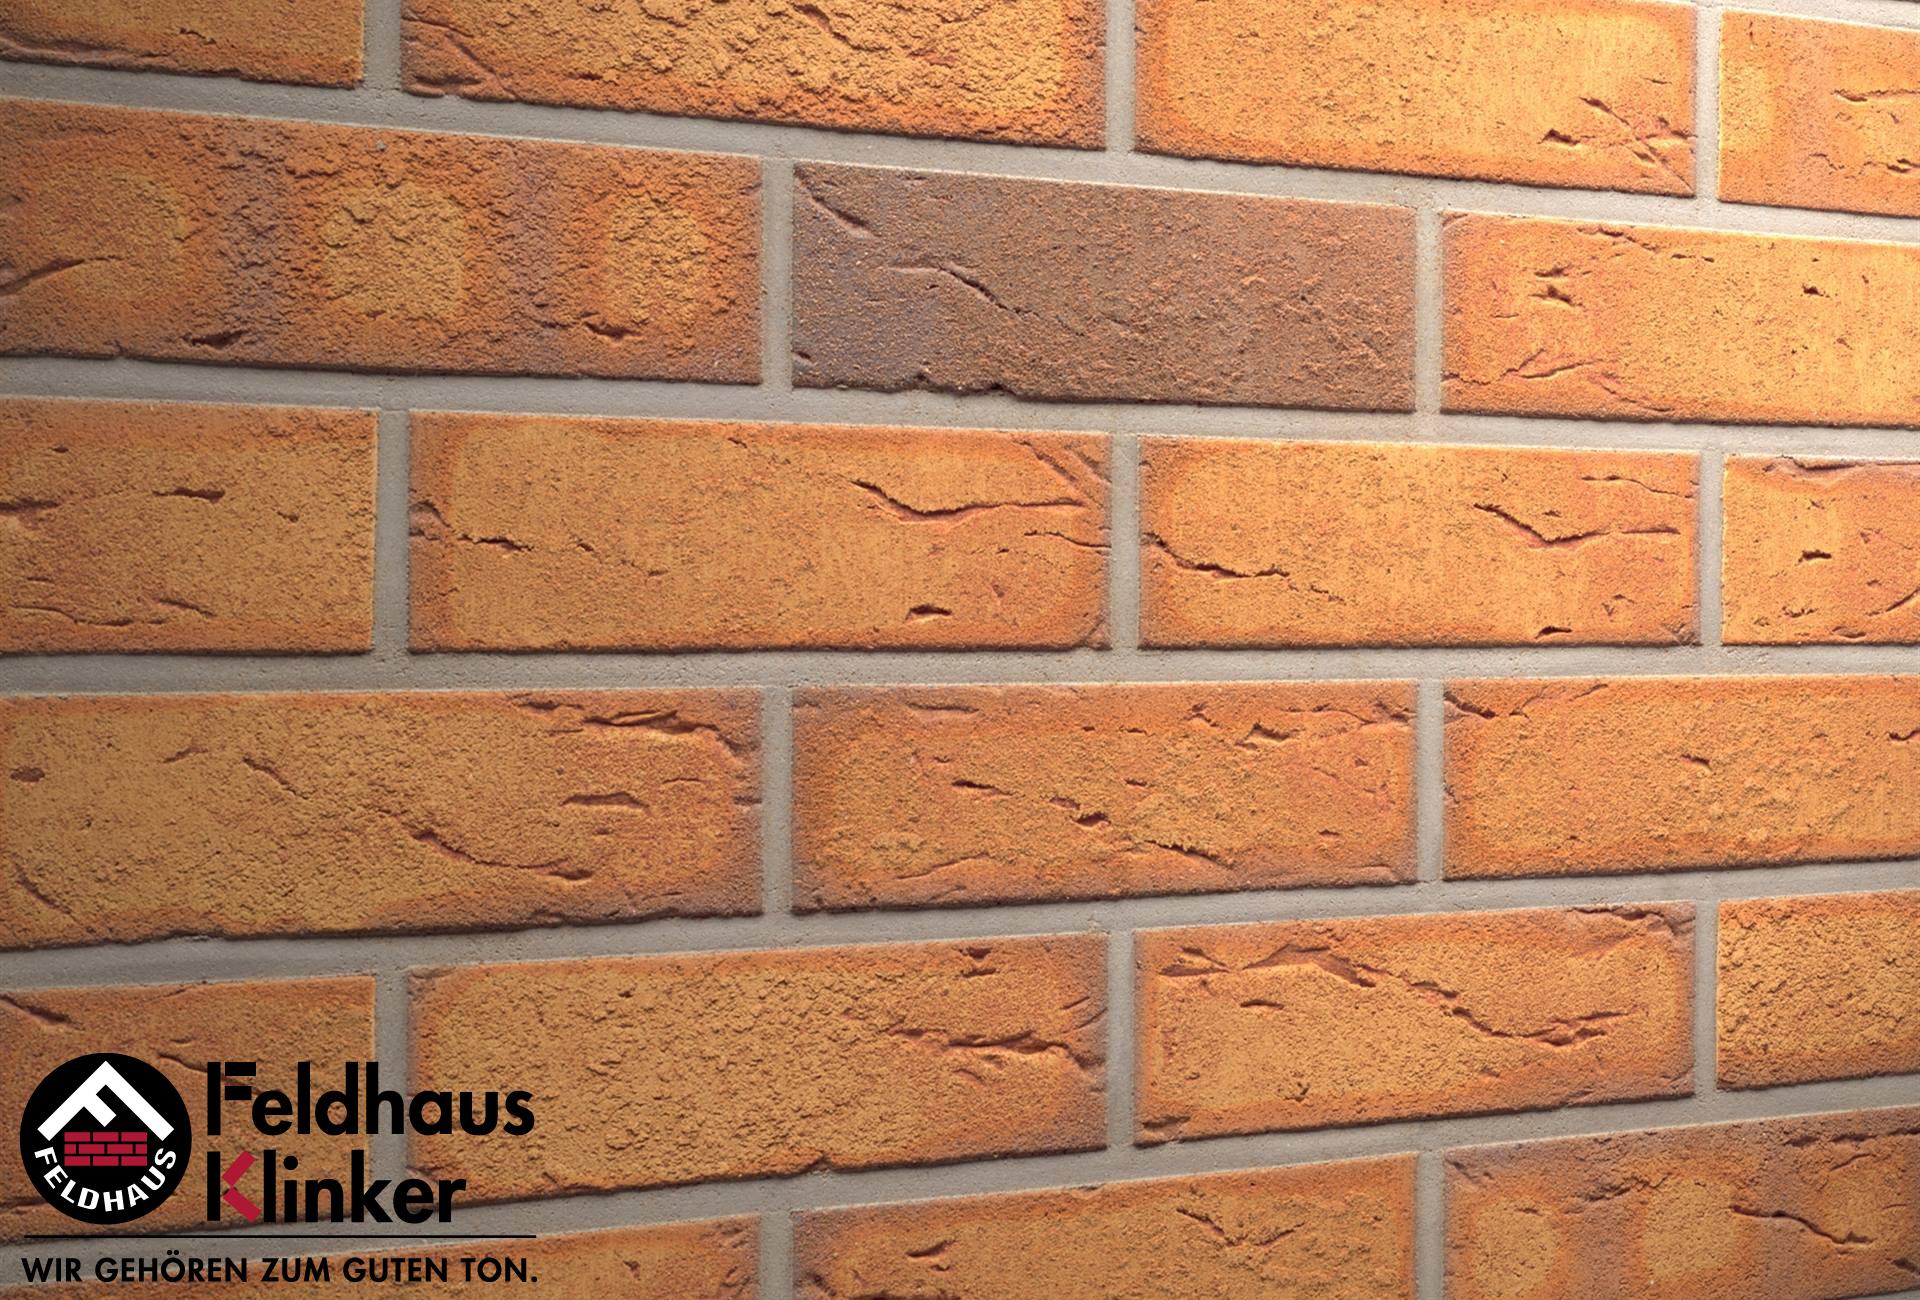 R268 Feldhaus Klinker клинкерная плитка 1